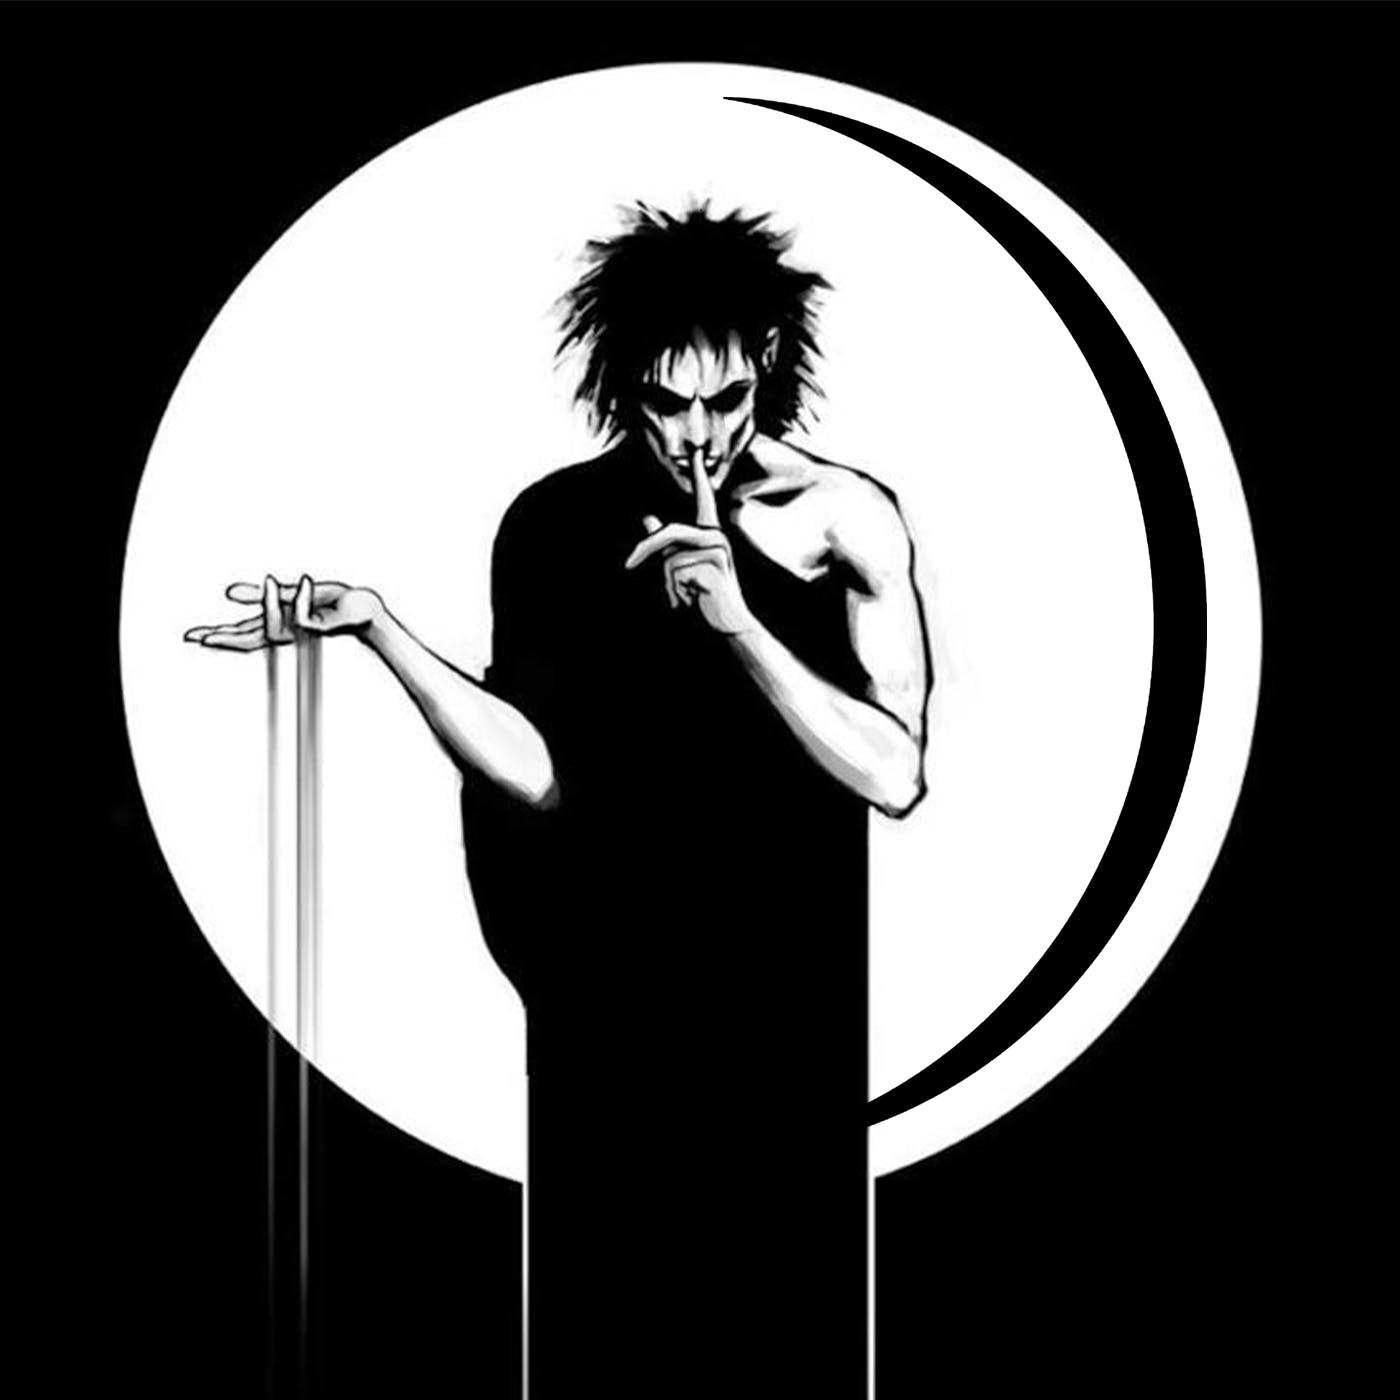 SANDMAN e l'Eterno Ritorno: Neil Gaiman, Eraclito e Nietzsche